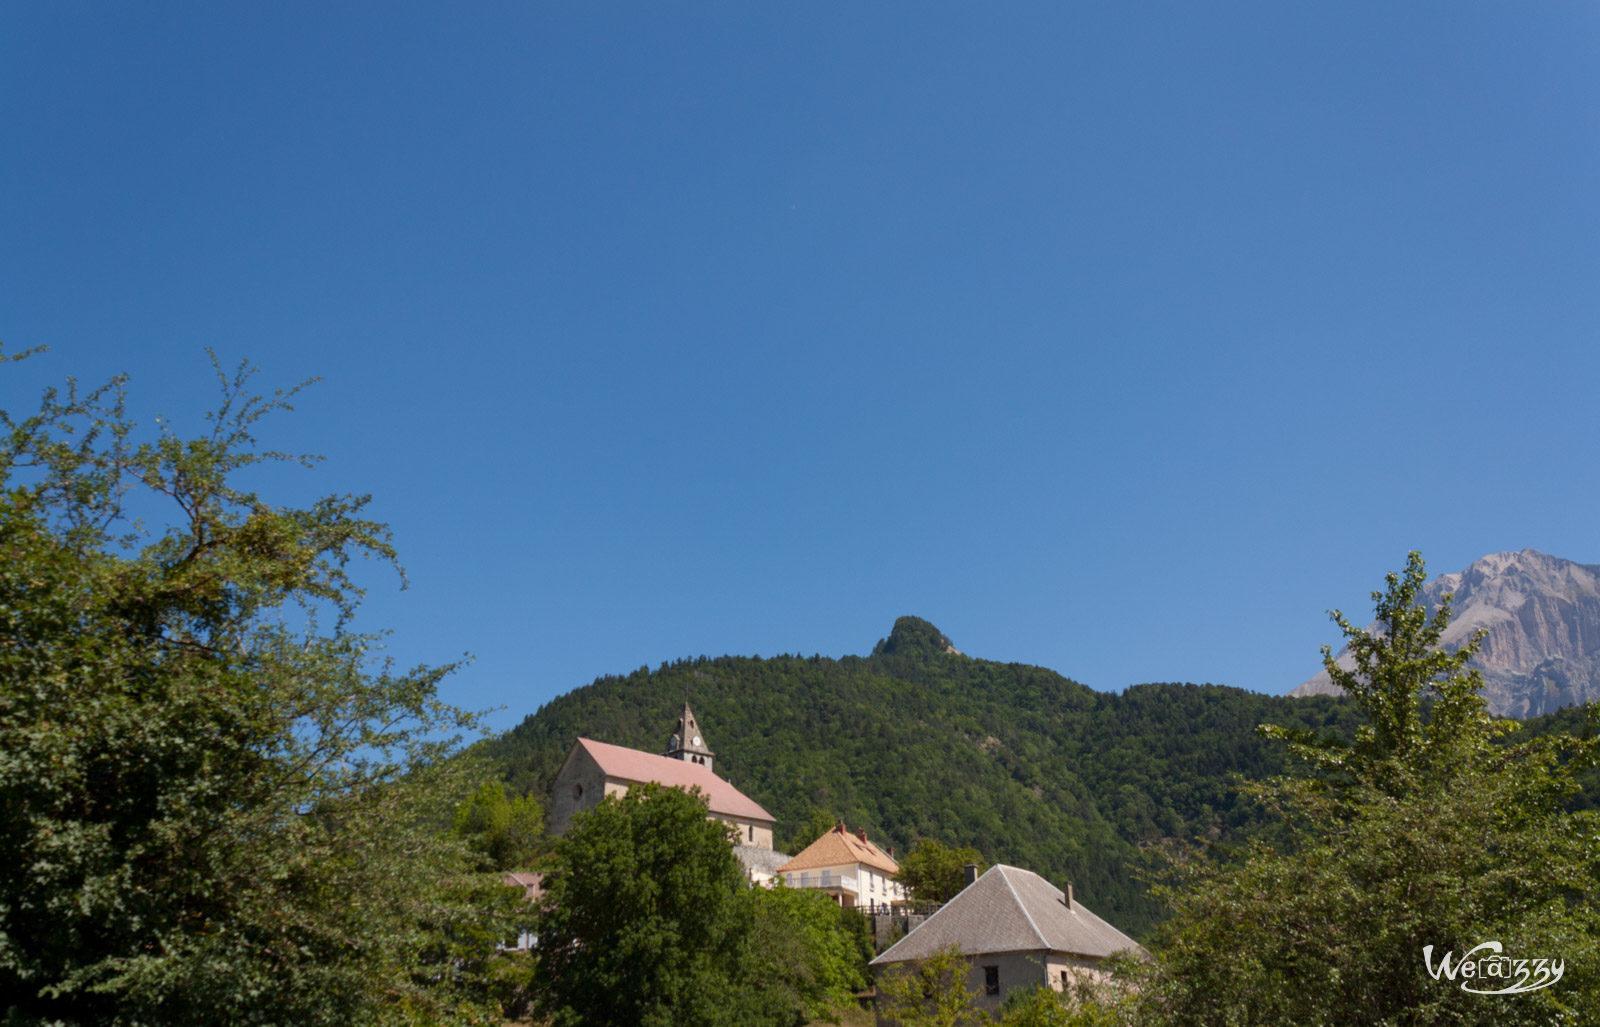 France, Montagne, Nature, Triève